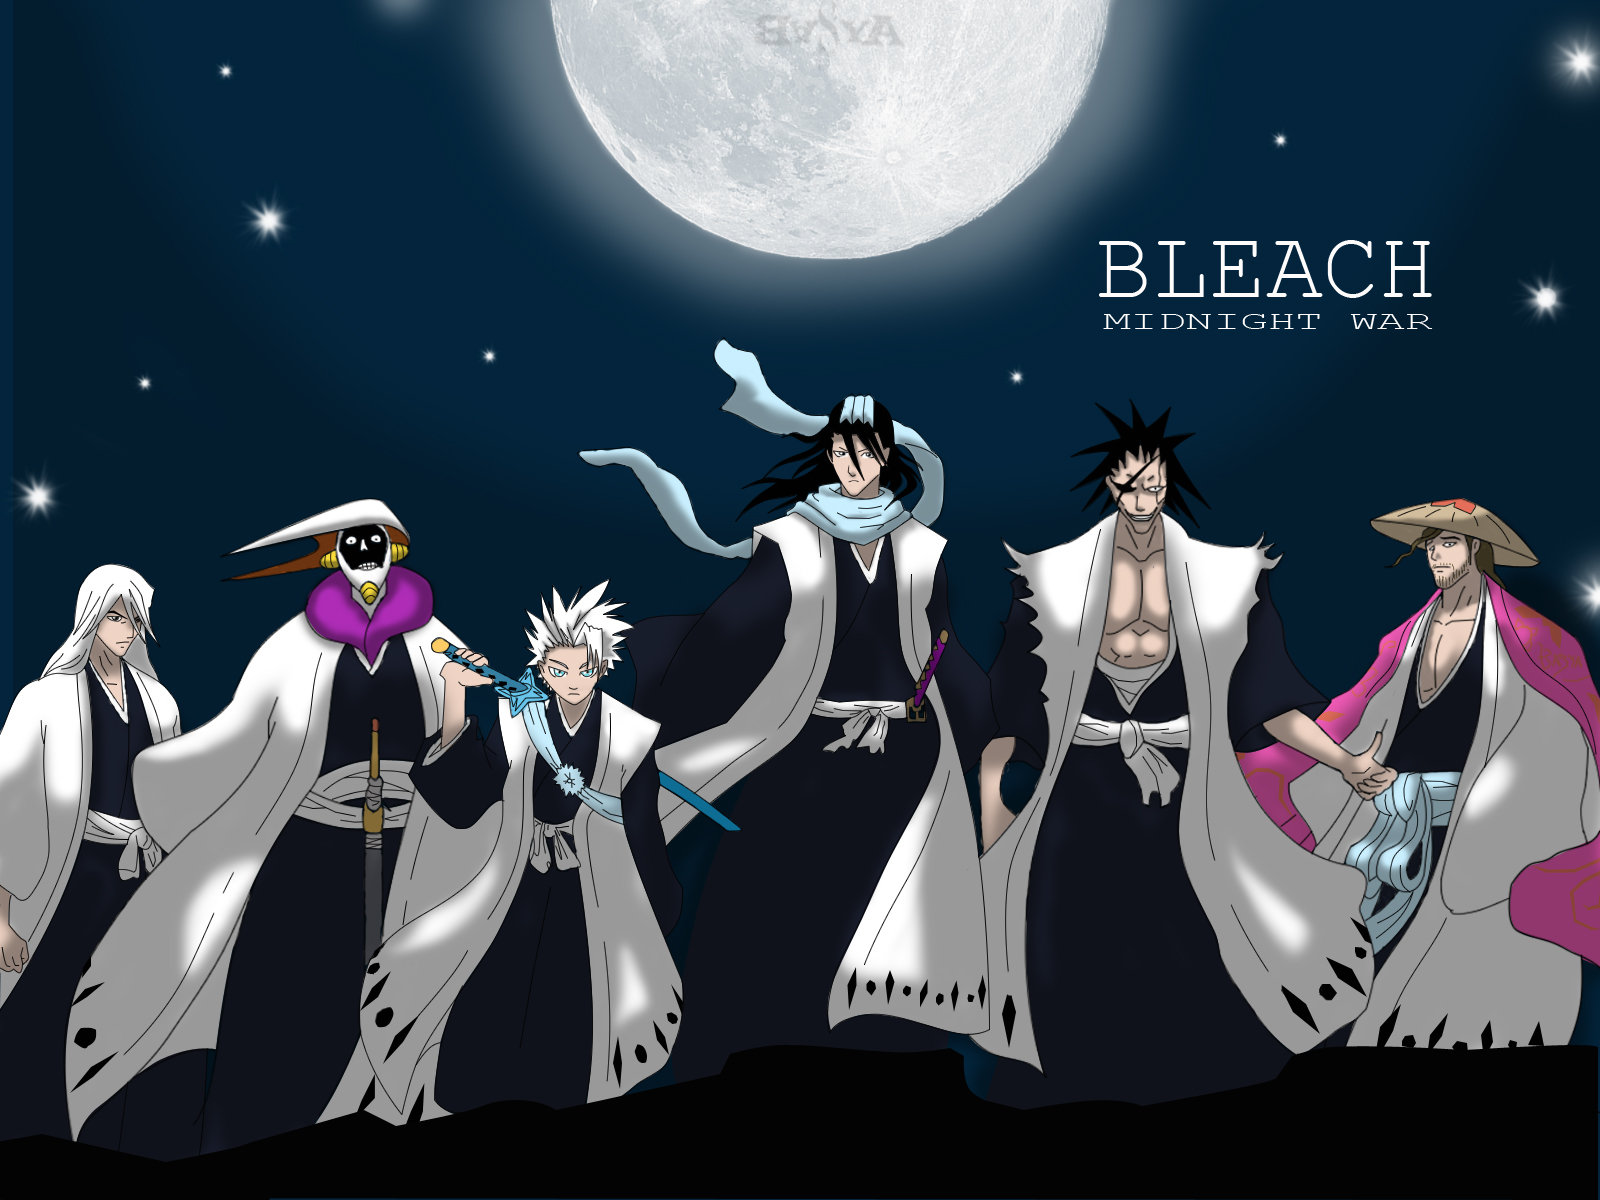 Bleach fond d 39 cran and arri re plan 1600x1200 id 295267 for Photo ecran bleach